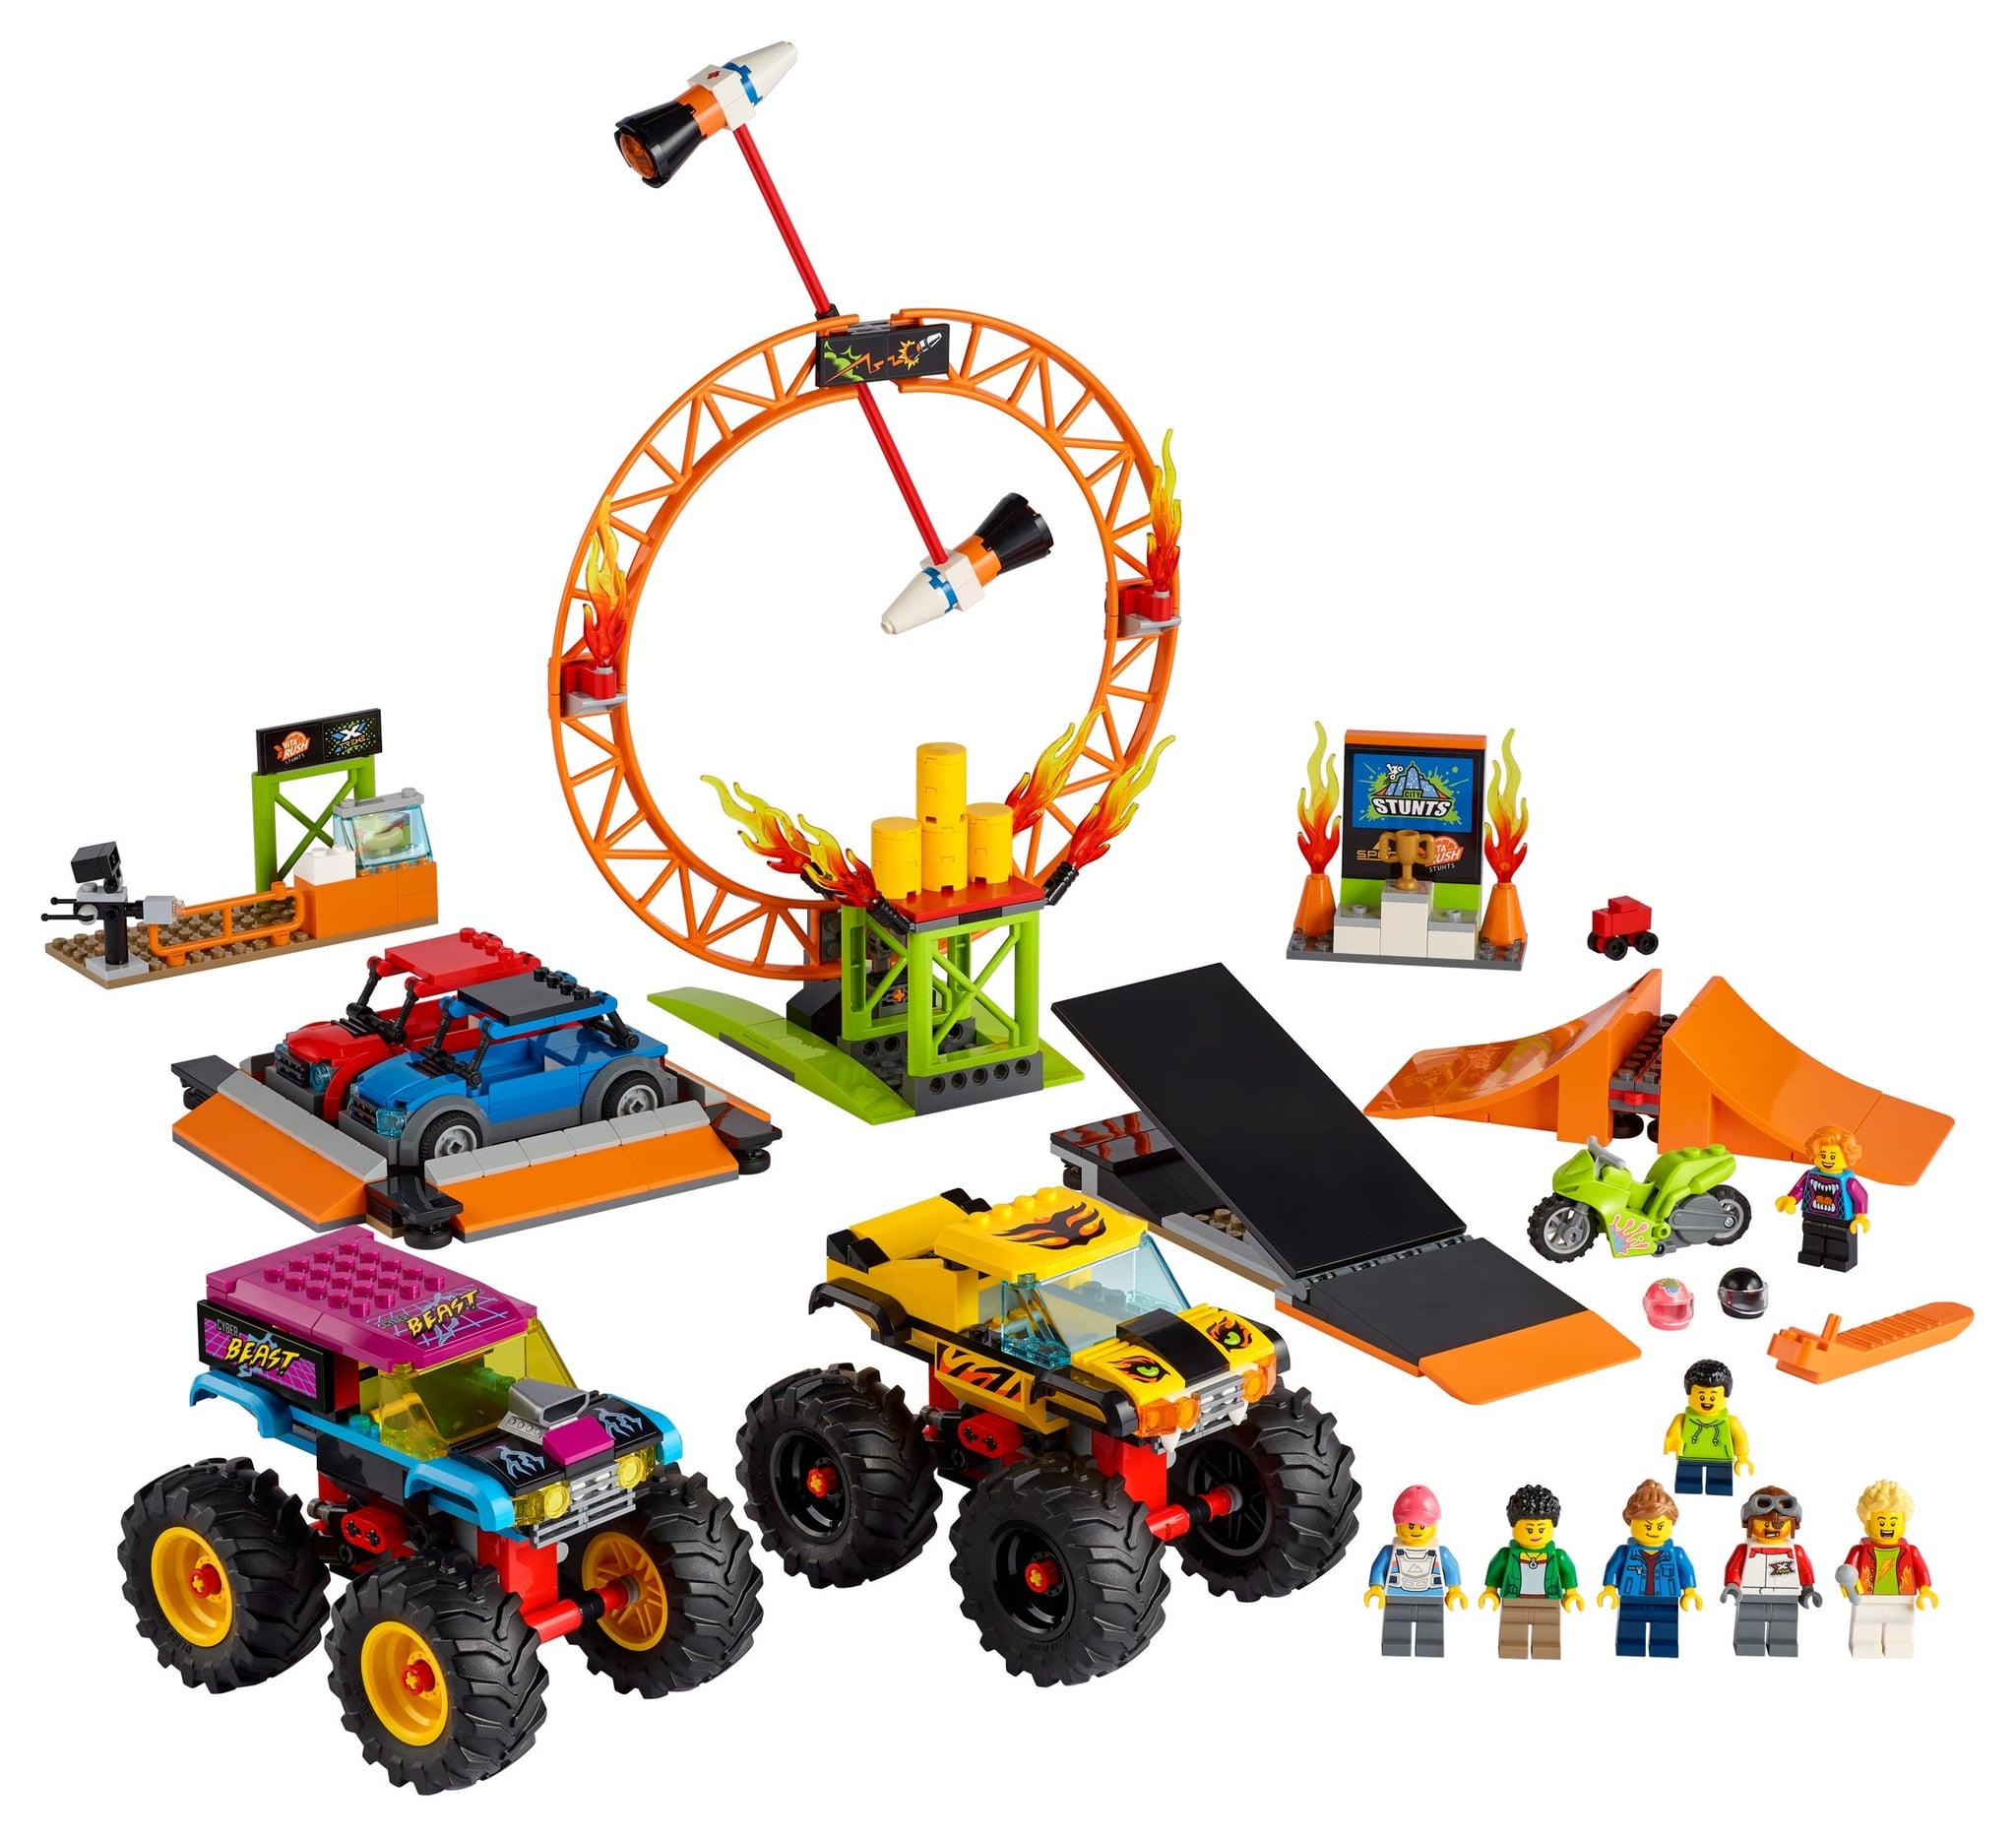 LEGO introduces flywheel-powered bikes with LEGO City Stuntz sets 19